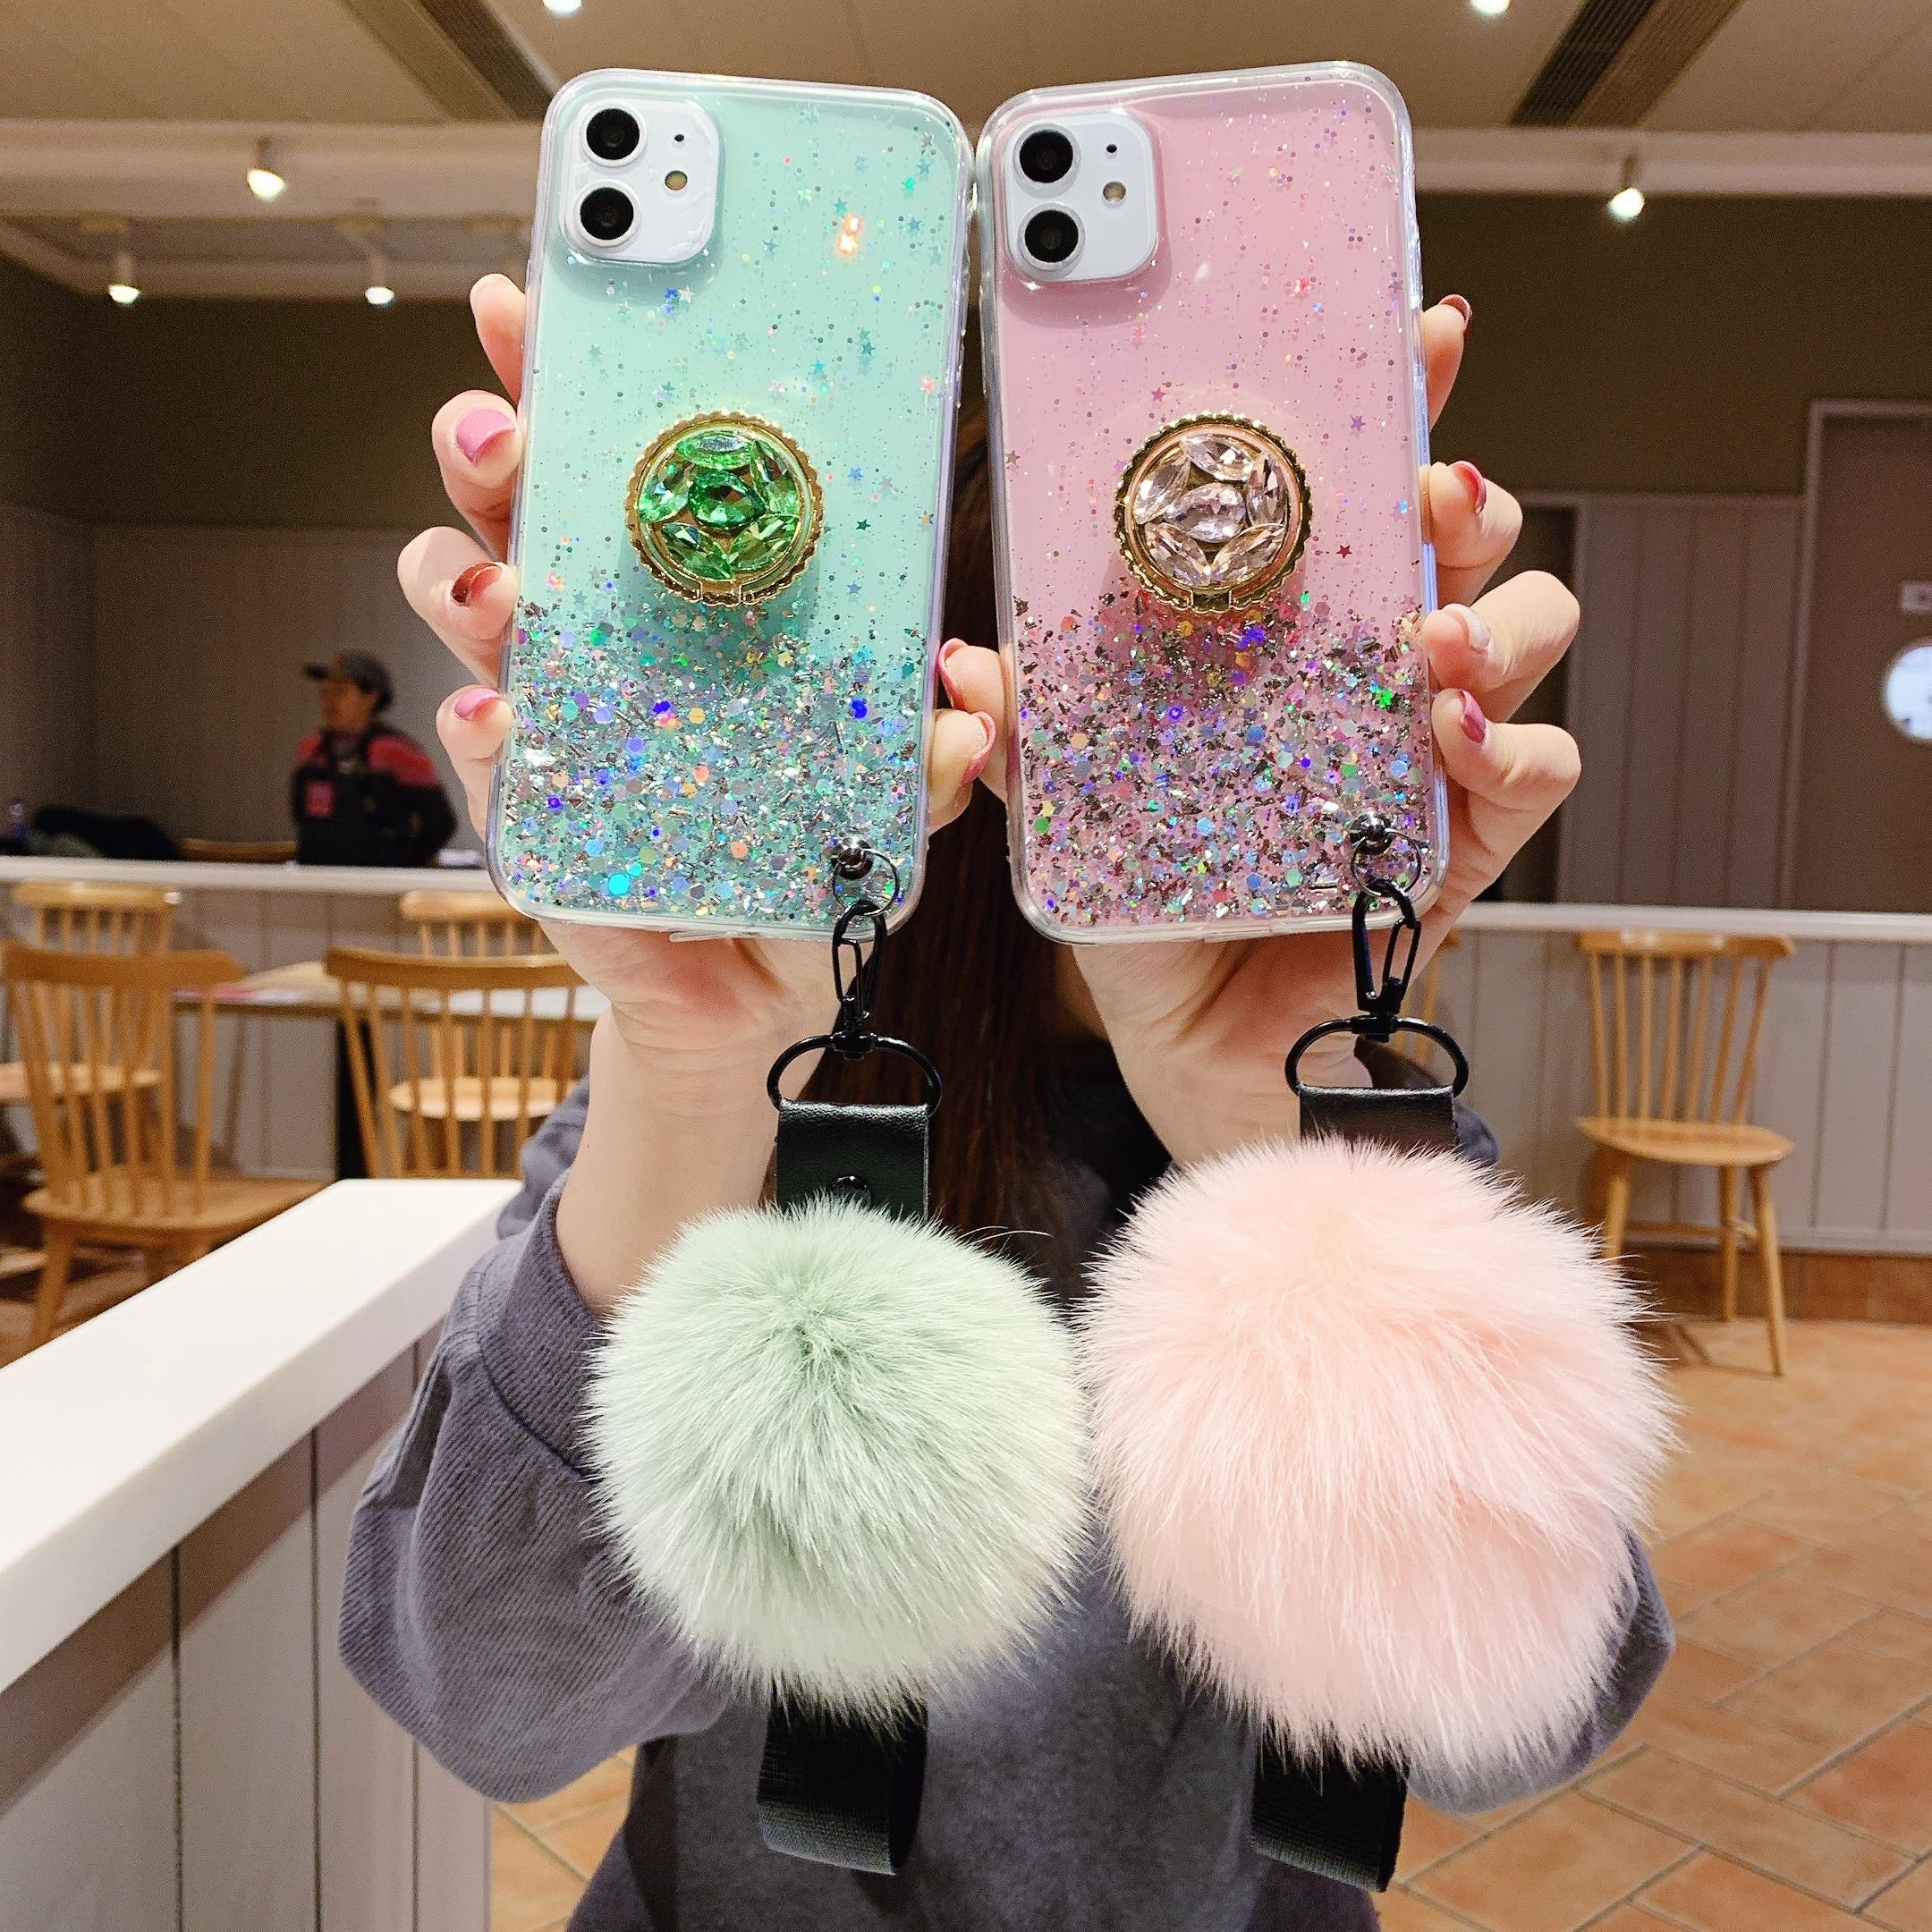 Starry Sky Flüssigkeit Weiche Silikon Pelz Ball Band Pompom Halter Telefon Fall Für Xiaomi Redmi Pyo 4X 5A 7A Hinweis 4 5 6 7 8 EINE 8T 10 Pro